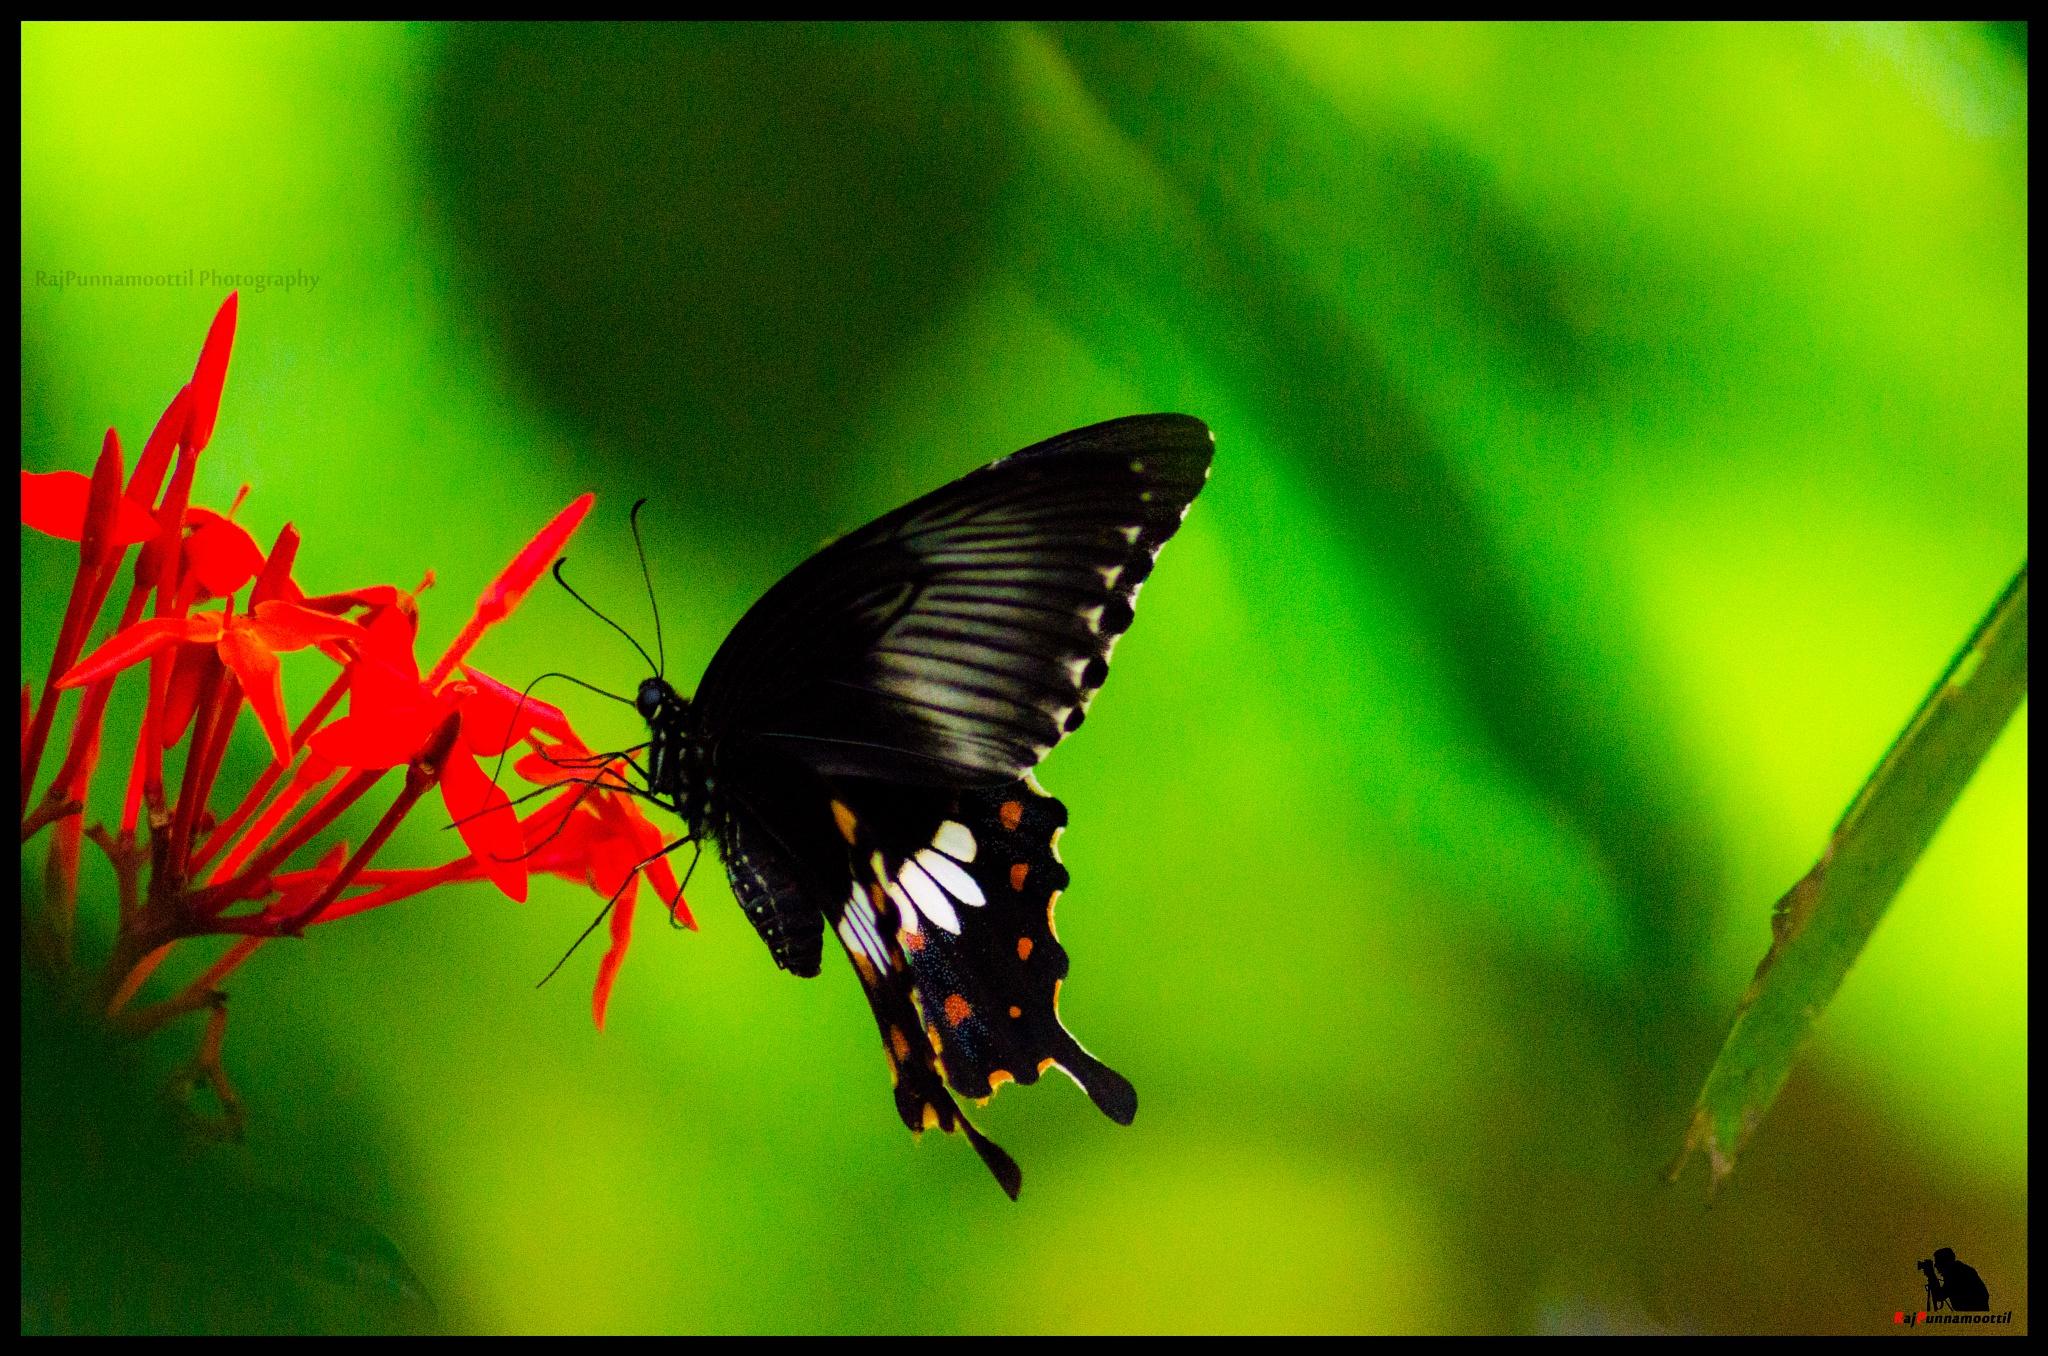 RajPunnamoottil Photography by Raj Punnamoottil